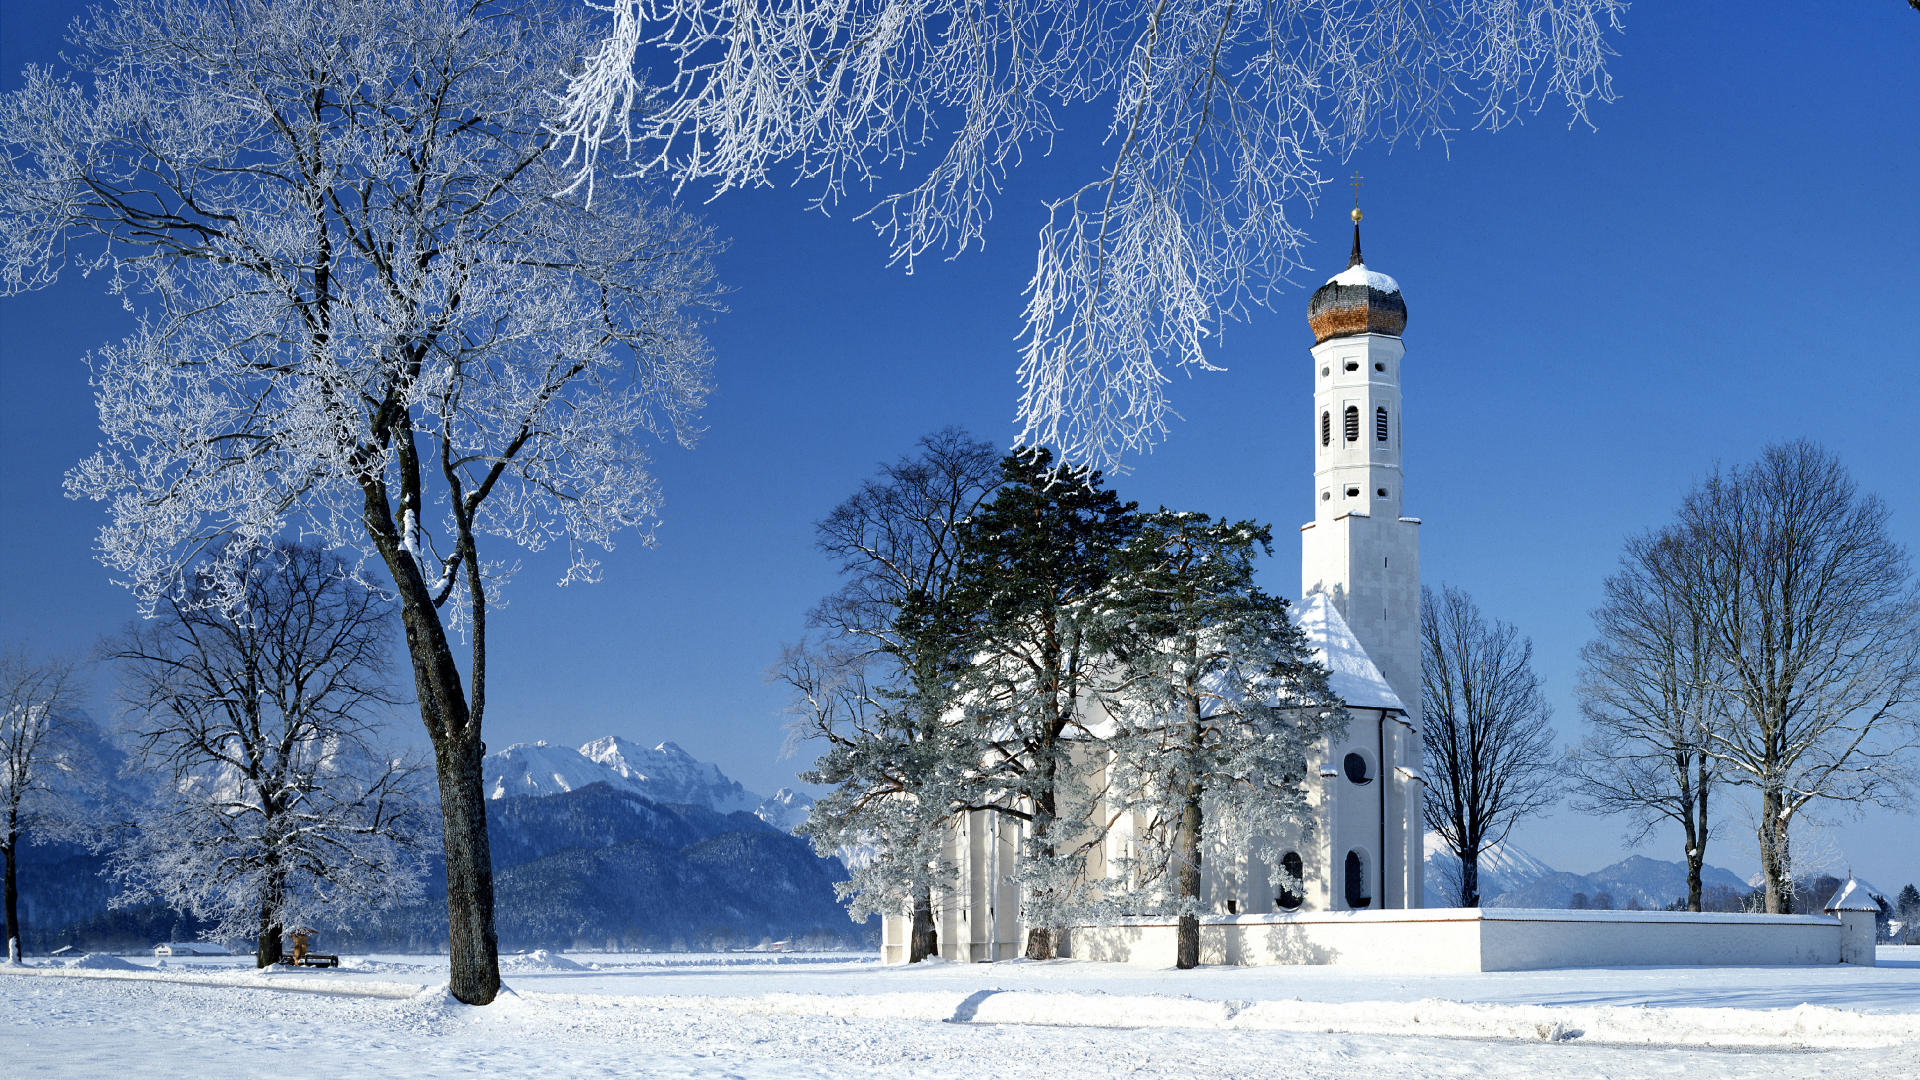 Free Winter Background Images WallpaperSafari